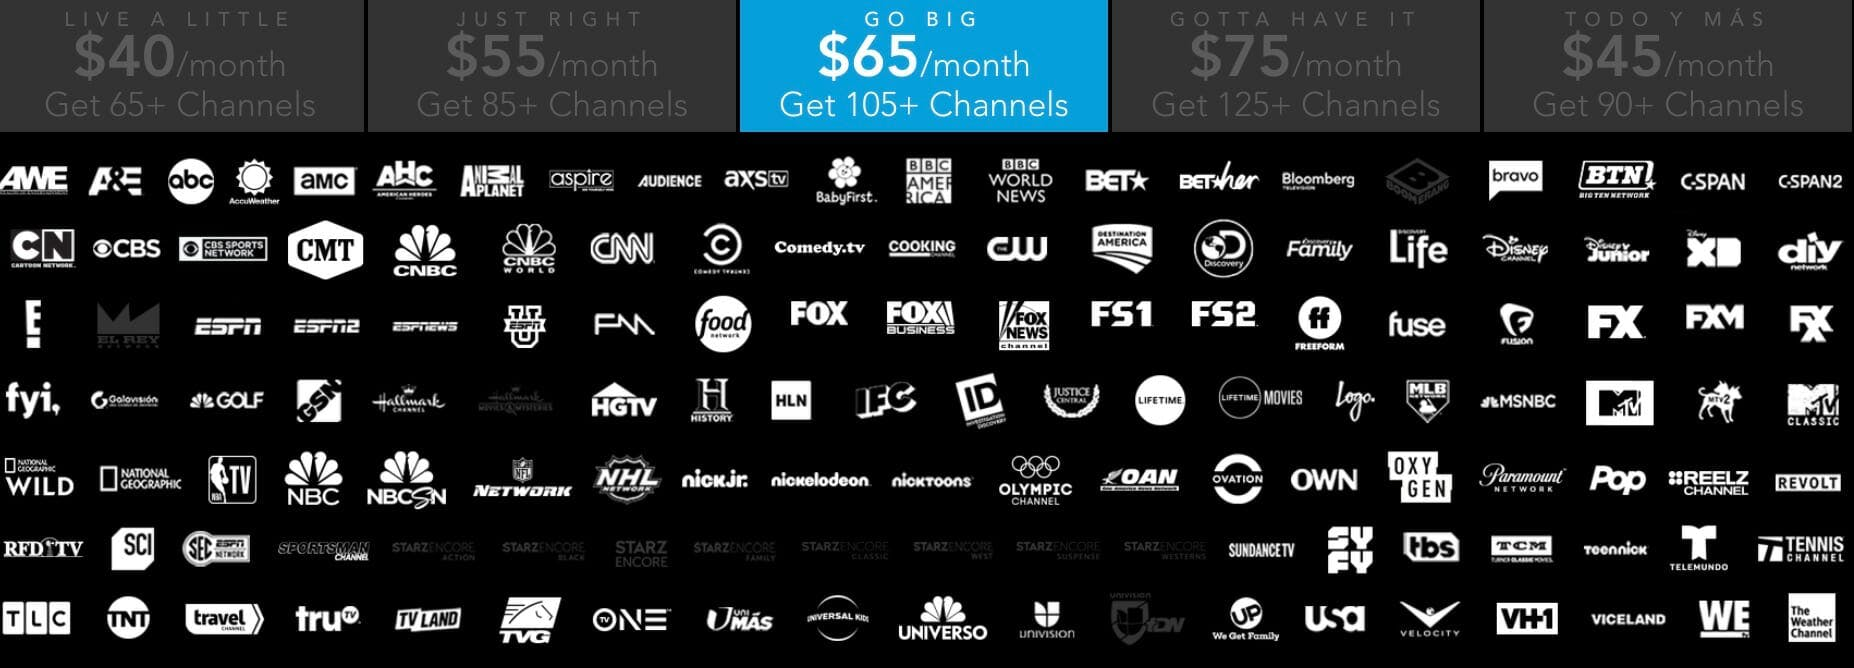 directv now channels list - go big